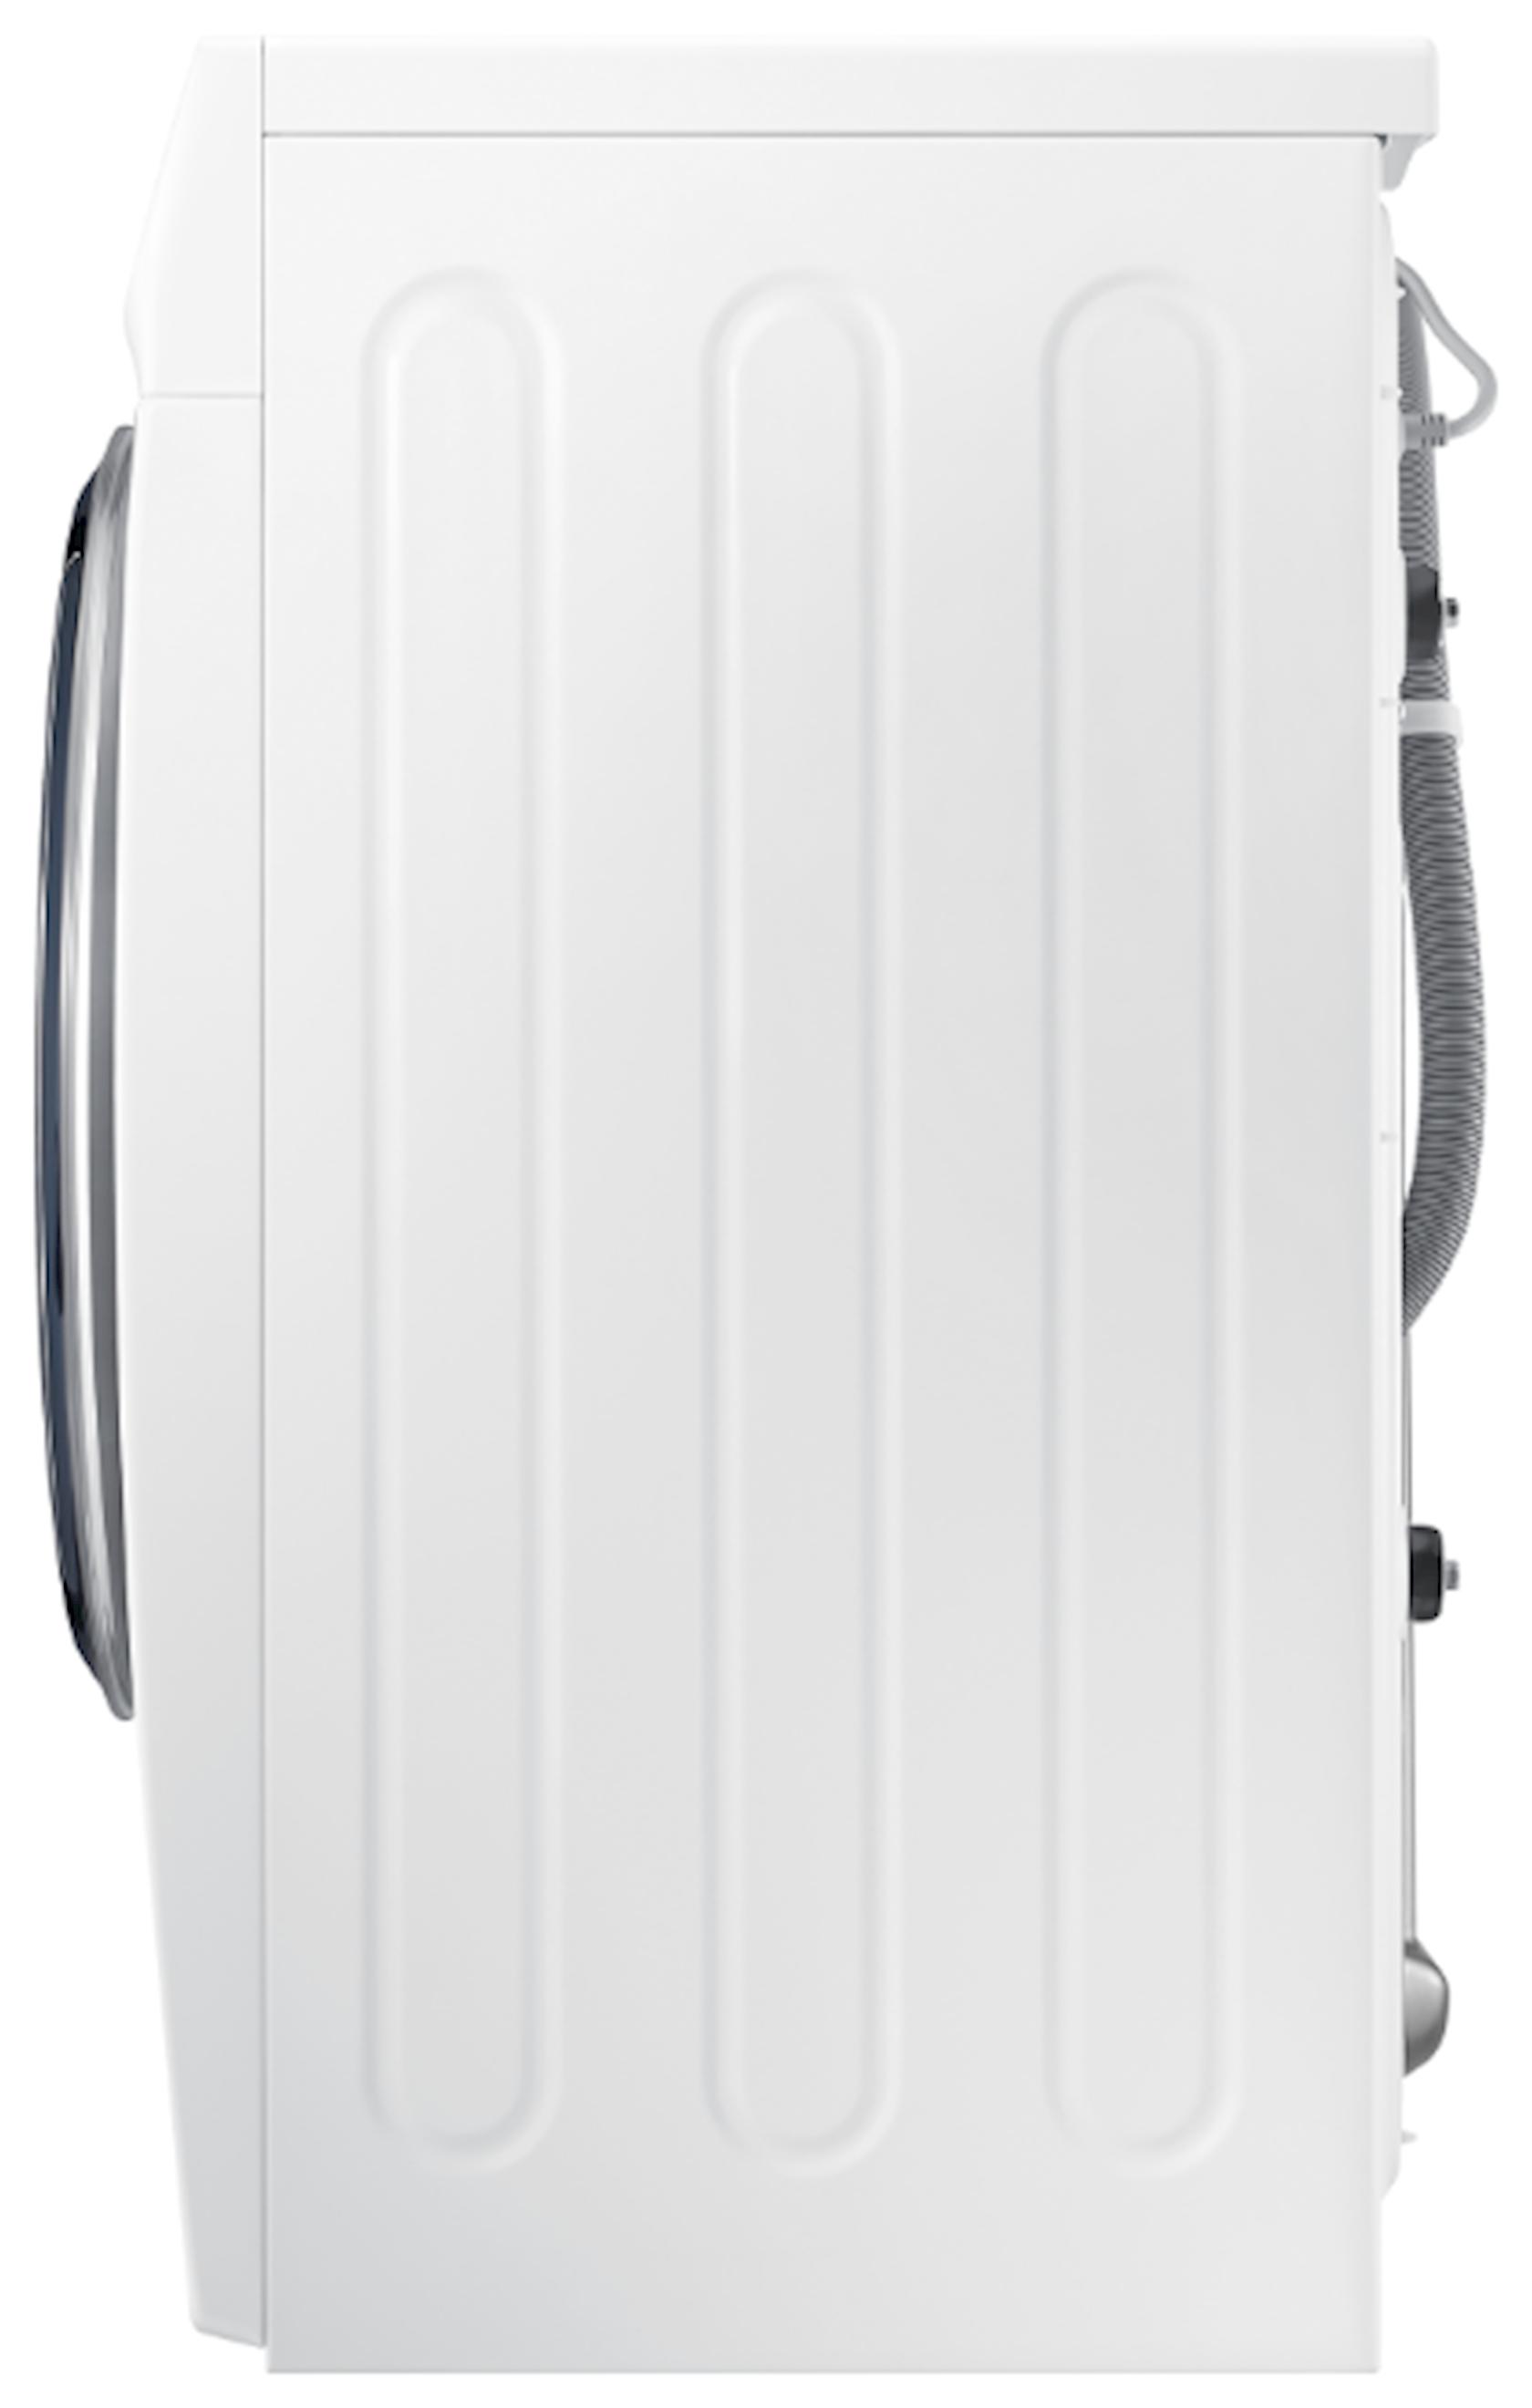 Paltaryuyan Samsung 7kq WW70R62LVTWDLP